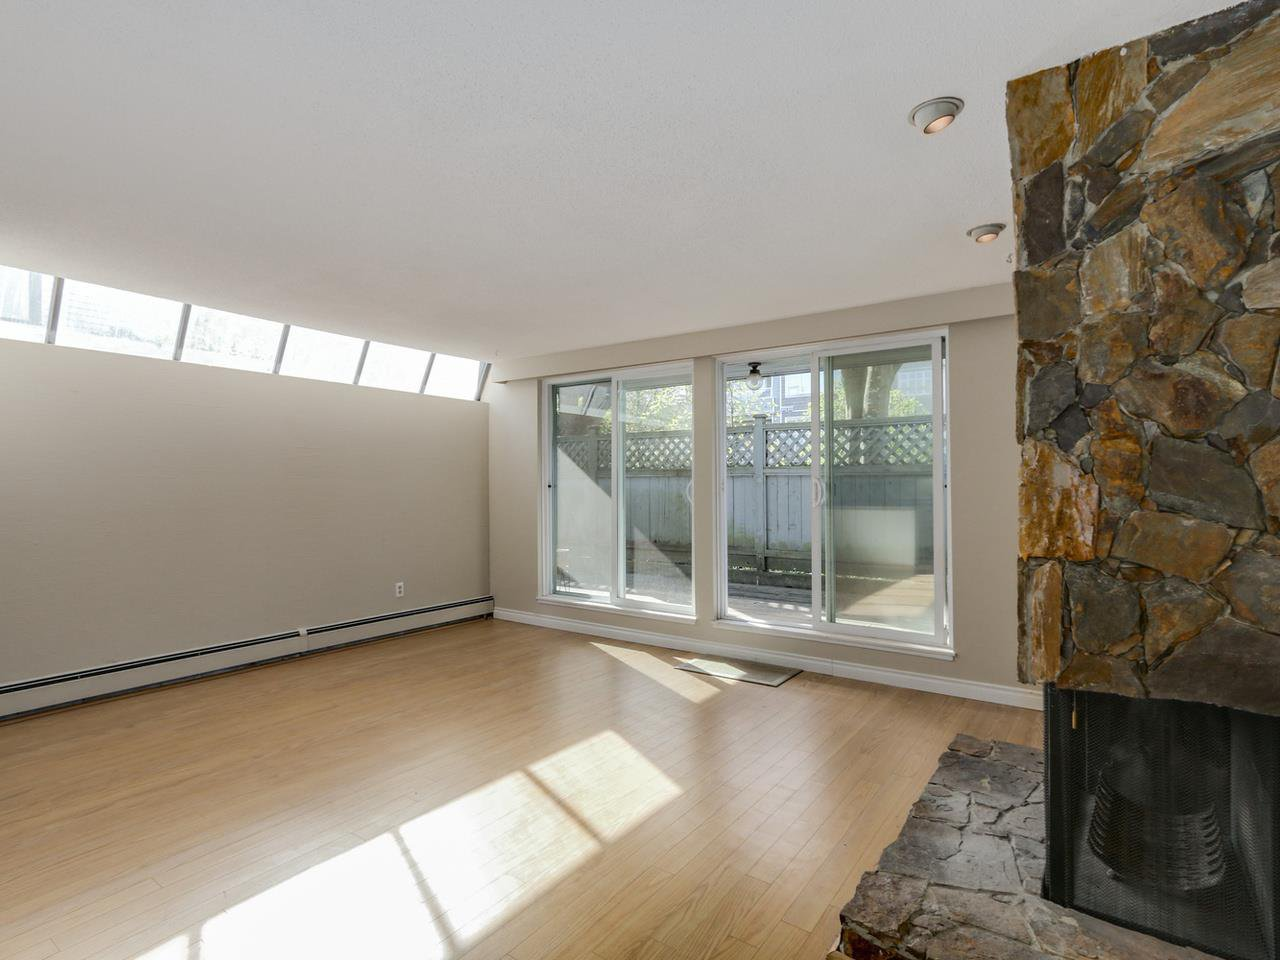 "Photo 7: Photos: 115 2125 YORK Avenue in Vancouver: Kitsilano Condo for sale in ""YORK GARDENS"" (Vancouver West)  : MLS®# R2054686"